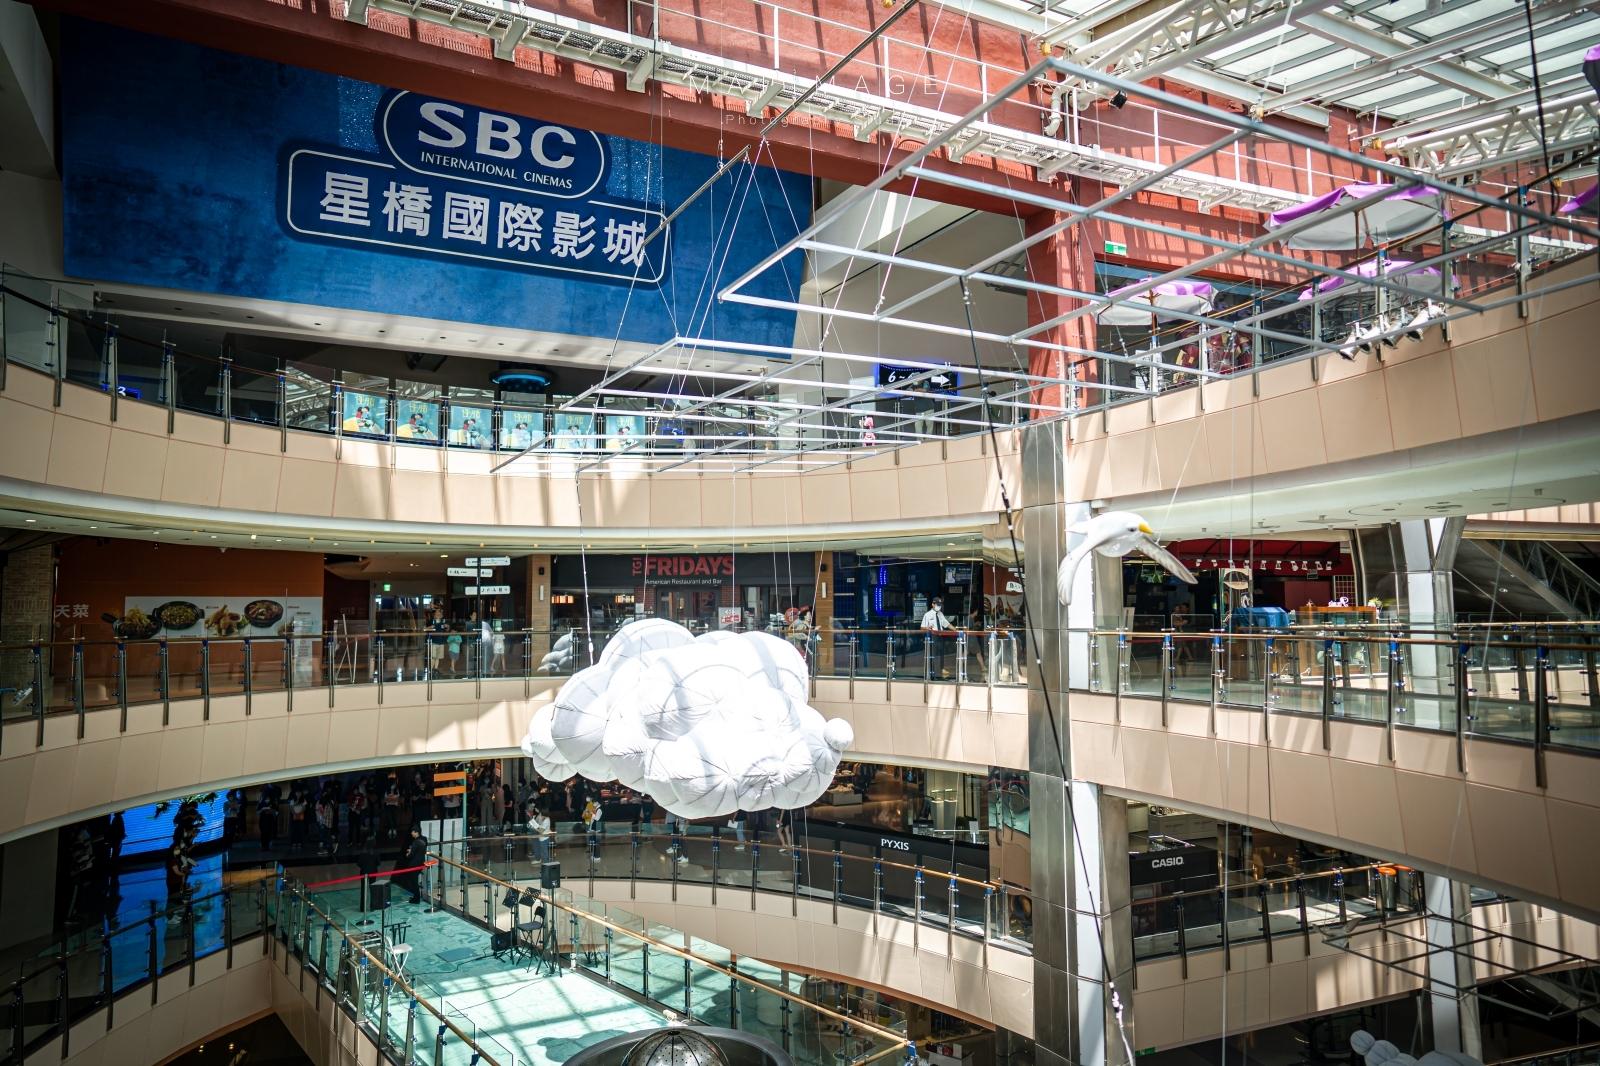 2020 Summer Shopping!桃園青埔商圈,大江購物中心 FUN 暑假囉,眾多優惠拿好拿滿!